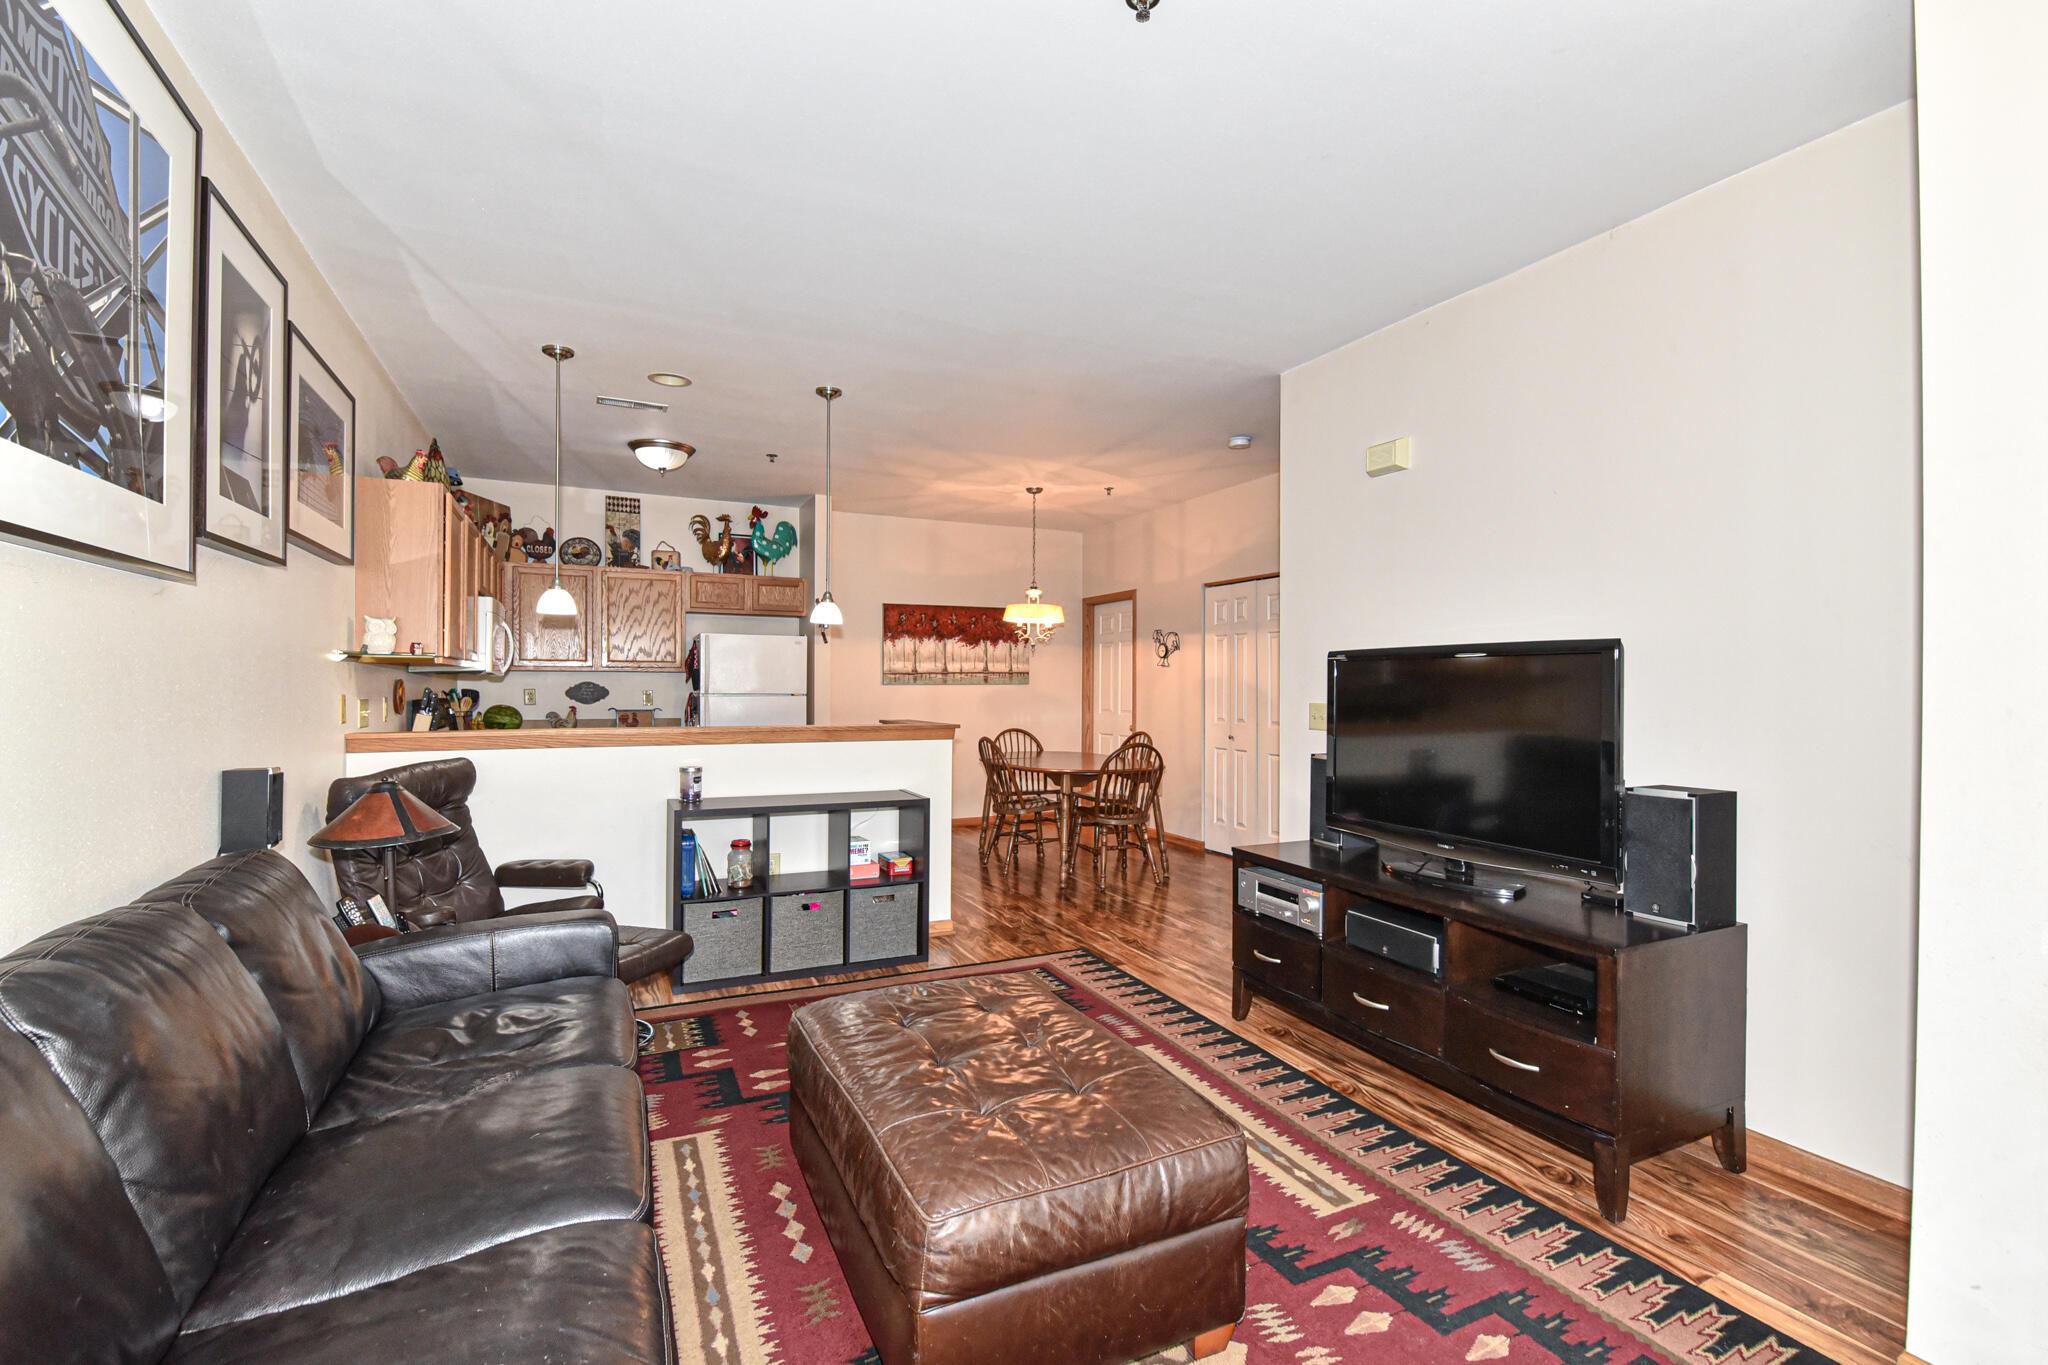 2424 Fox River Pkwy, Waukesha, Wisconsin 53189, 2 Bedrooms Bedrooms, 5 Rooms Rooms,1 BathroomBathrooms,Condominiums,For Sale,Fox River Pkwy,2,1754244